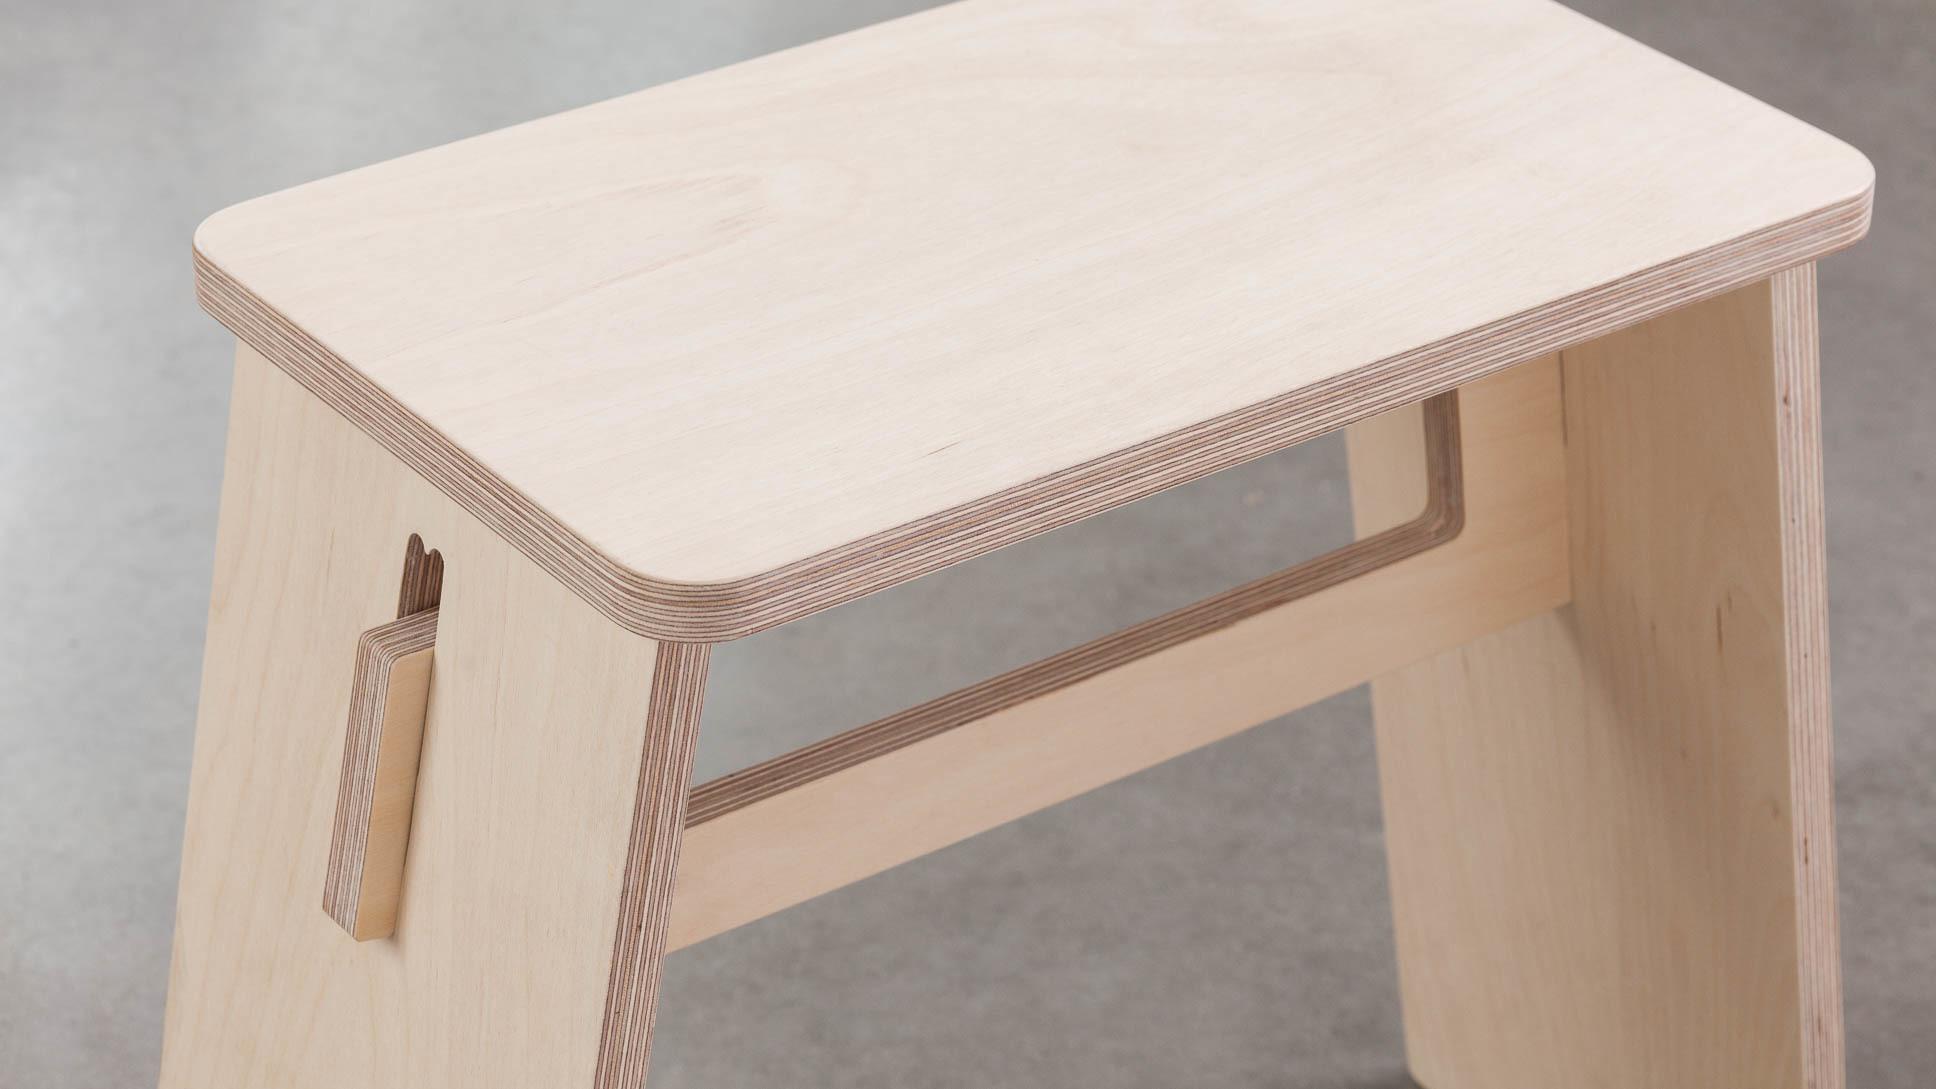 opendesk_furniture_johann-stool_product-page_gallery-image-Shot4-2300_v01.default